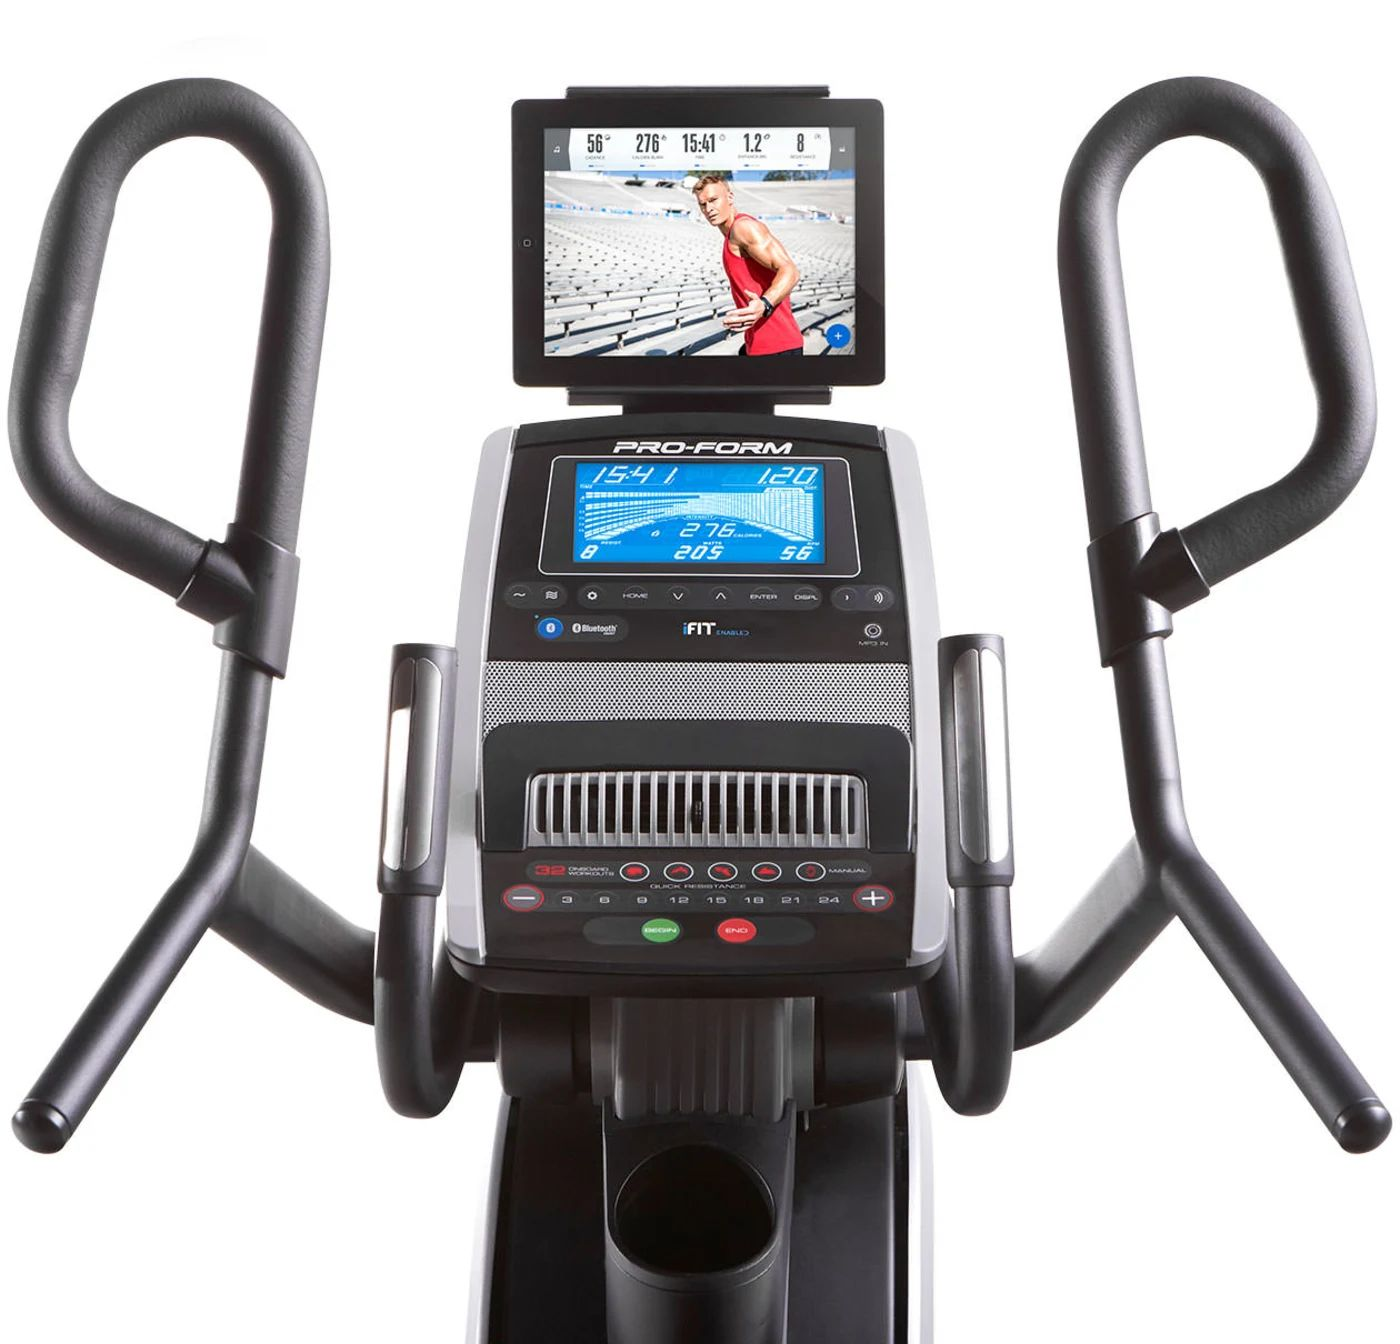 Smart Hiit Cardio Trainer Elliptical Stepper Proform Treadmill Wiring Diagram Gallery Image 5